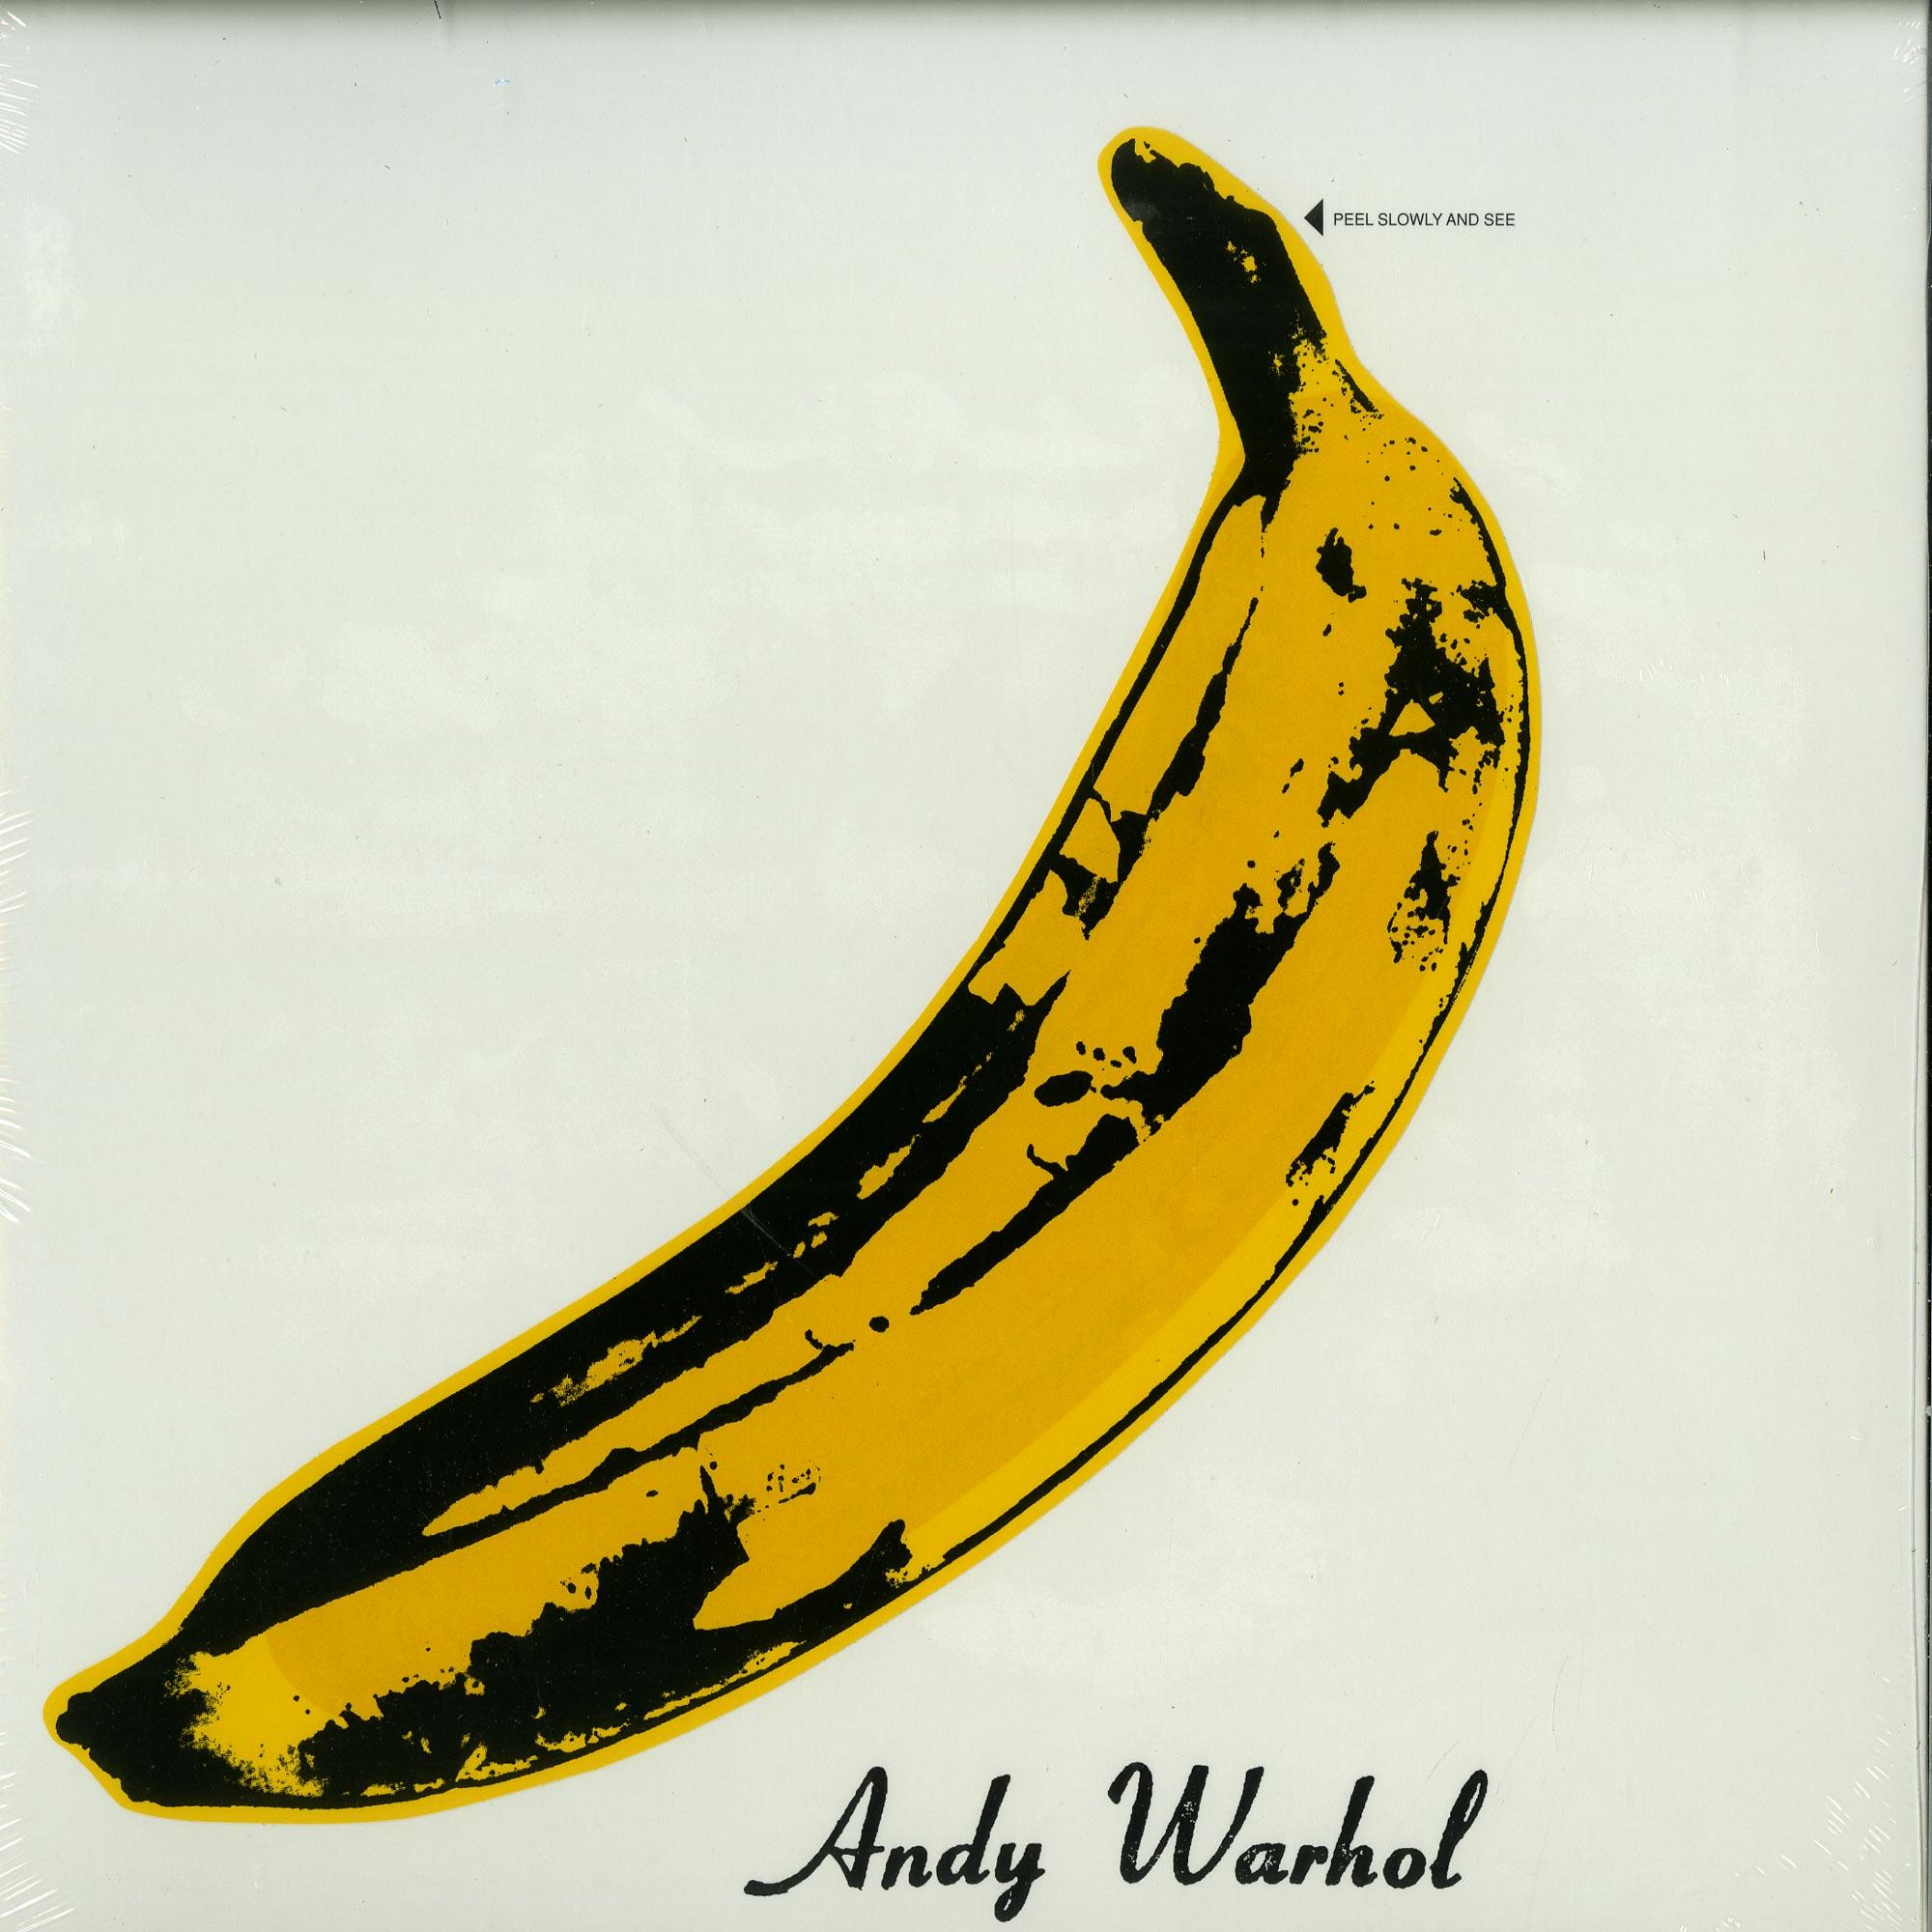 Velvet Underground - THE VELVET UNDERGROUND & NICO - 50TH ANNIVERSARY